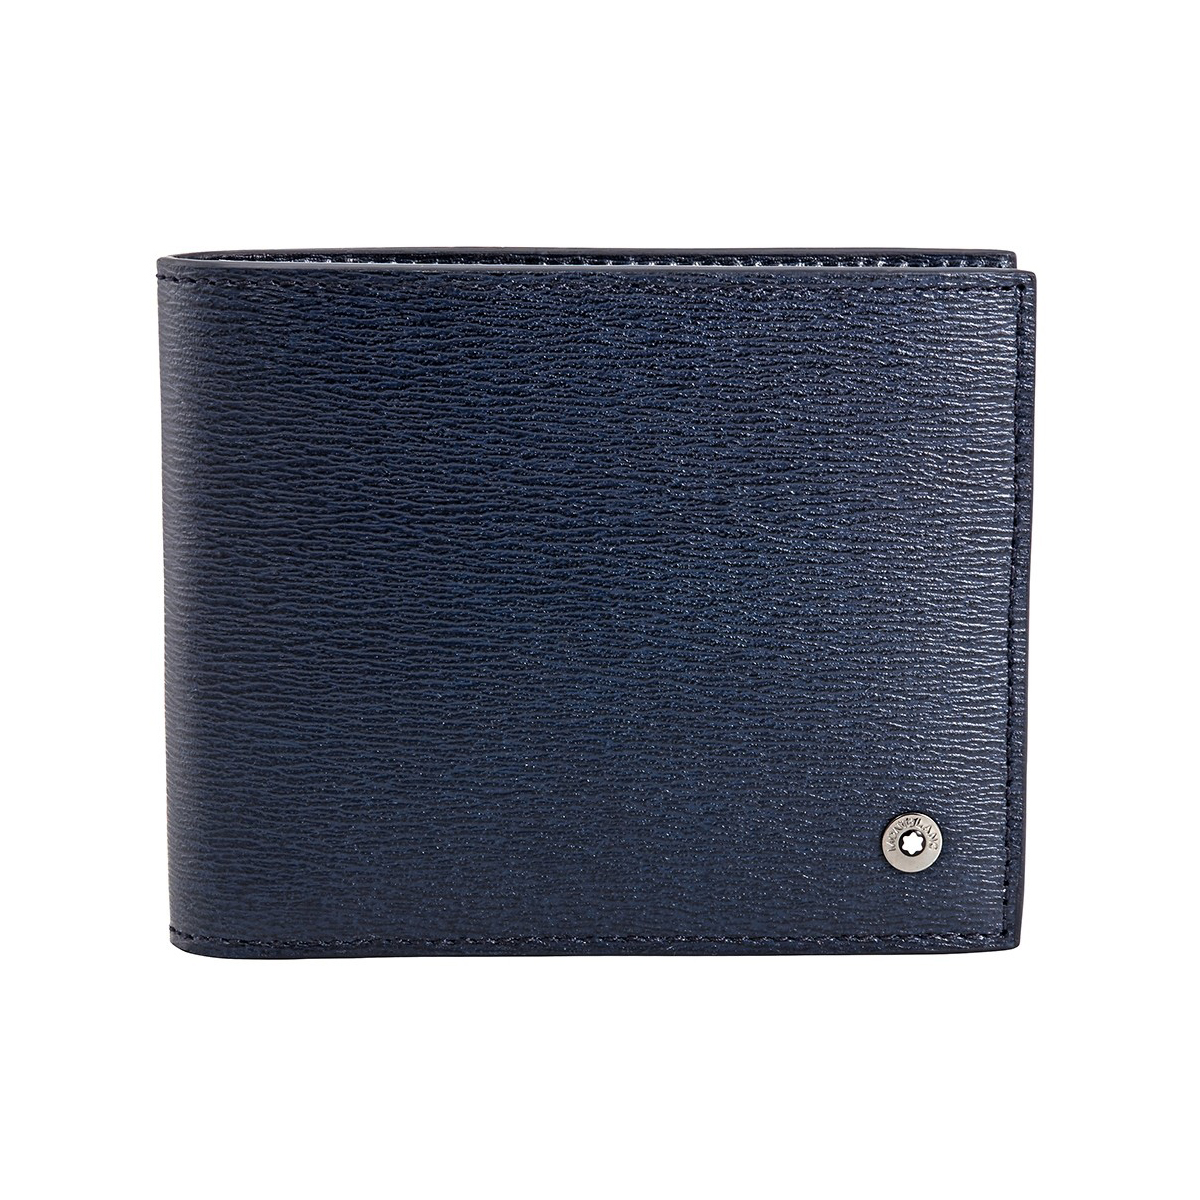 118653 — Montblanc 4810 Wst Wallet 6Cc Blue